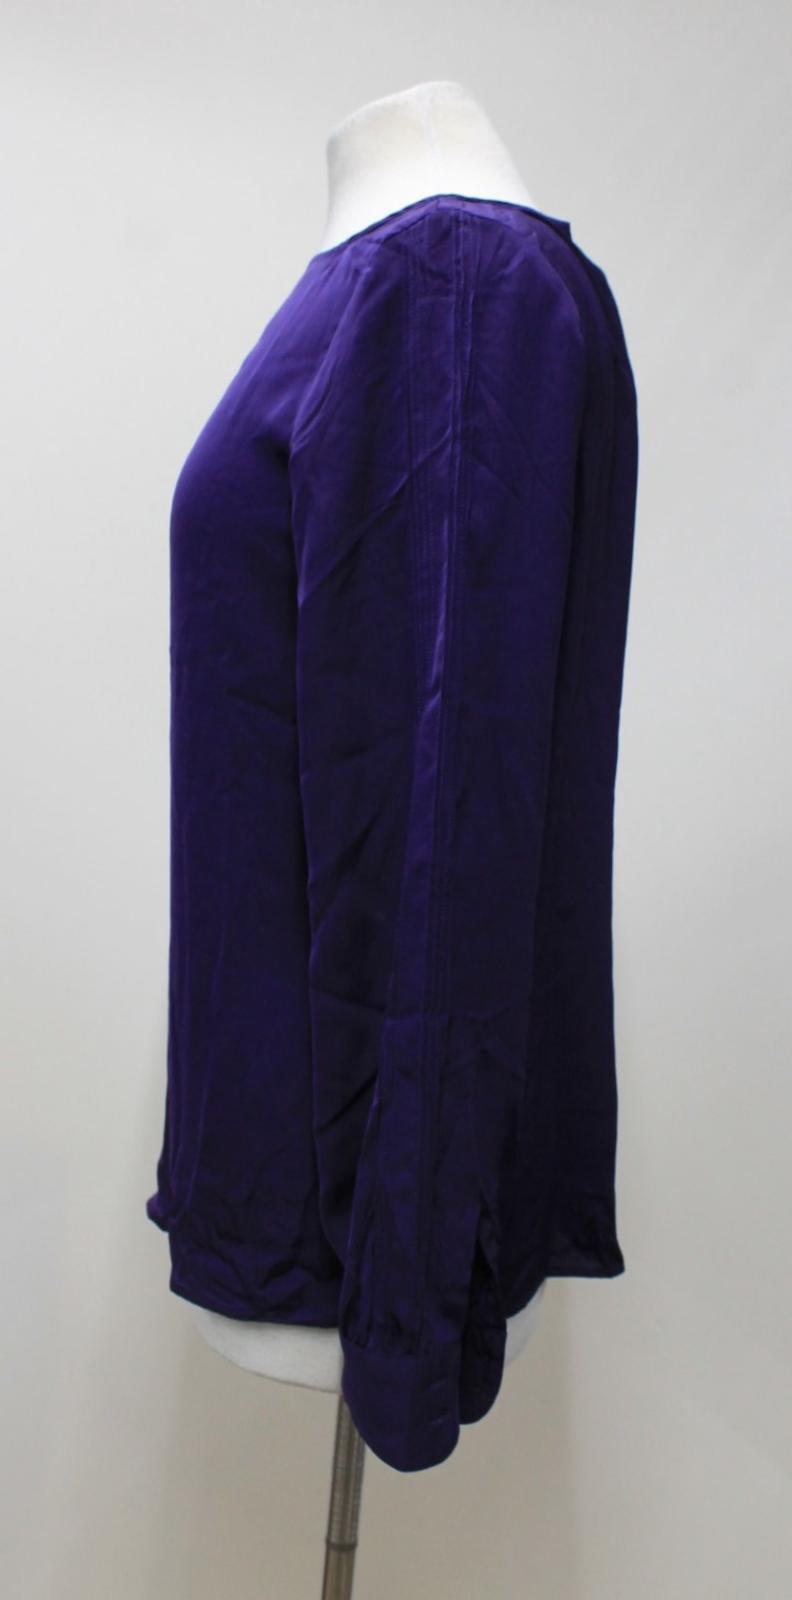 LAUREN-BY-RALPH-LAUREN-Ladies-Purple-Satin-Pleated-Sleeve-Round-Neck-Top-S thumbnail 5